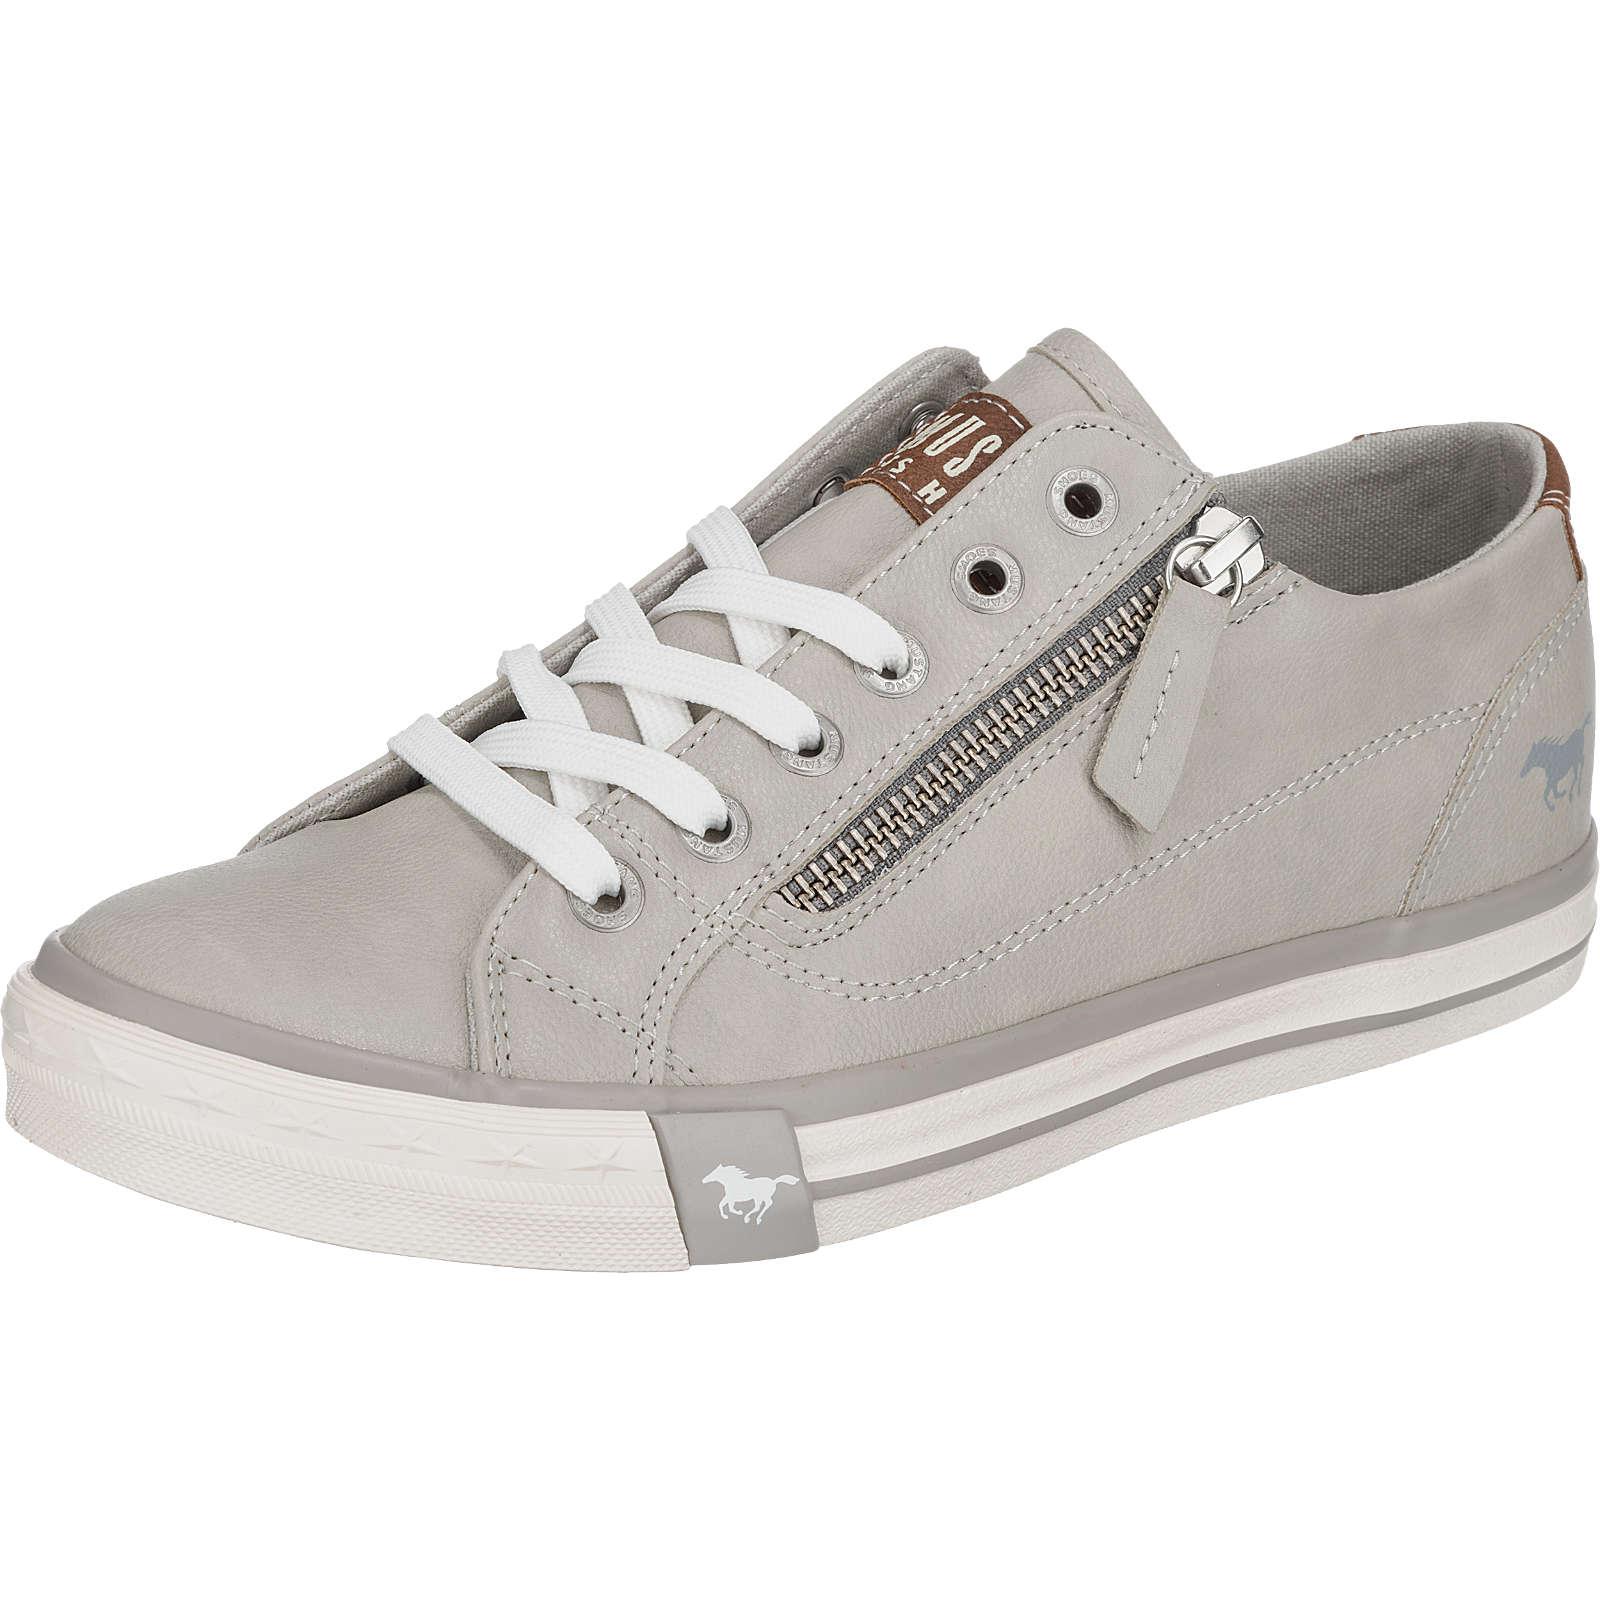 MUSTANG Sneakers Low hellgrau Damen Gr. 36